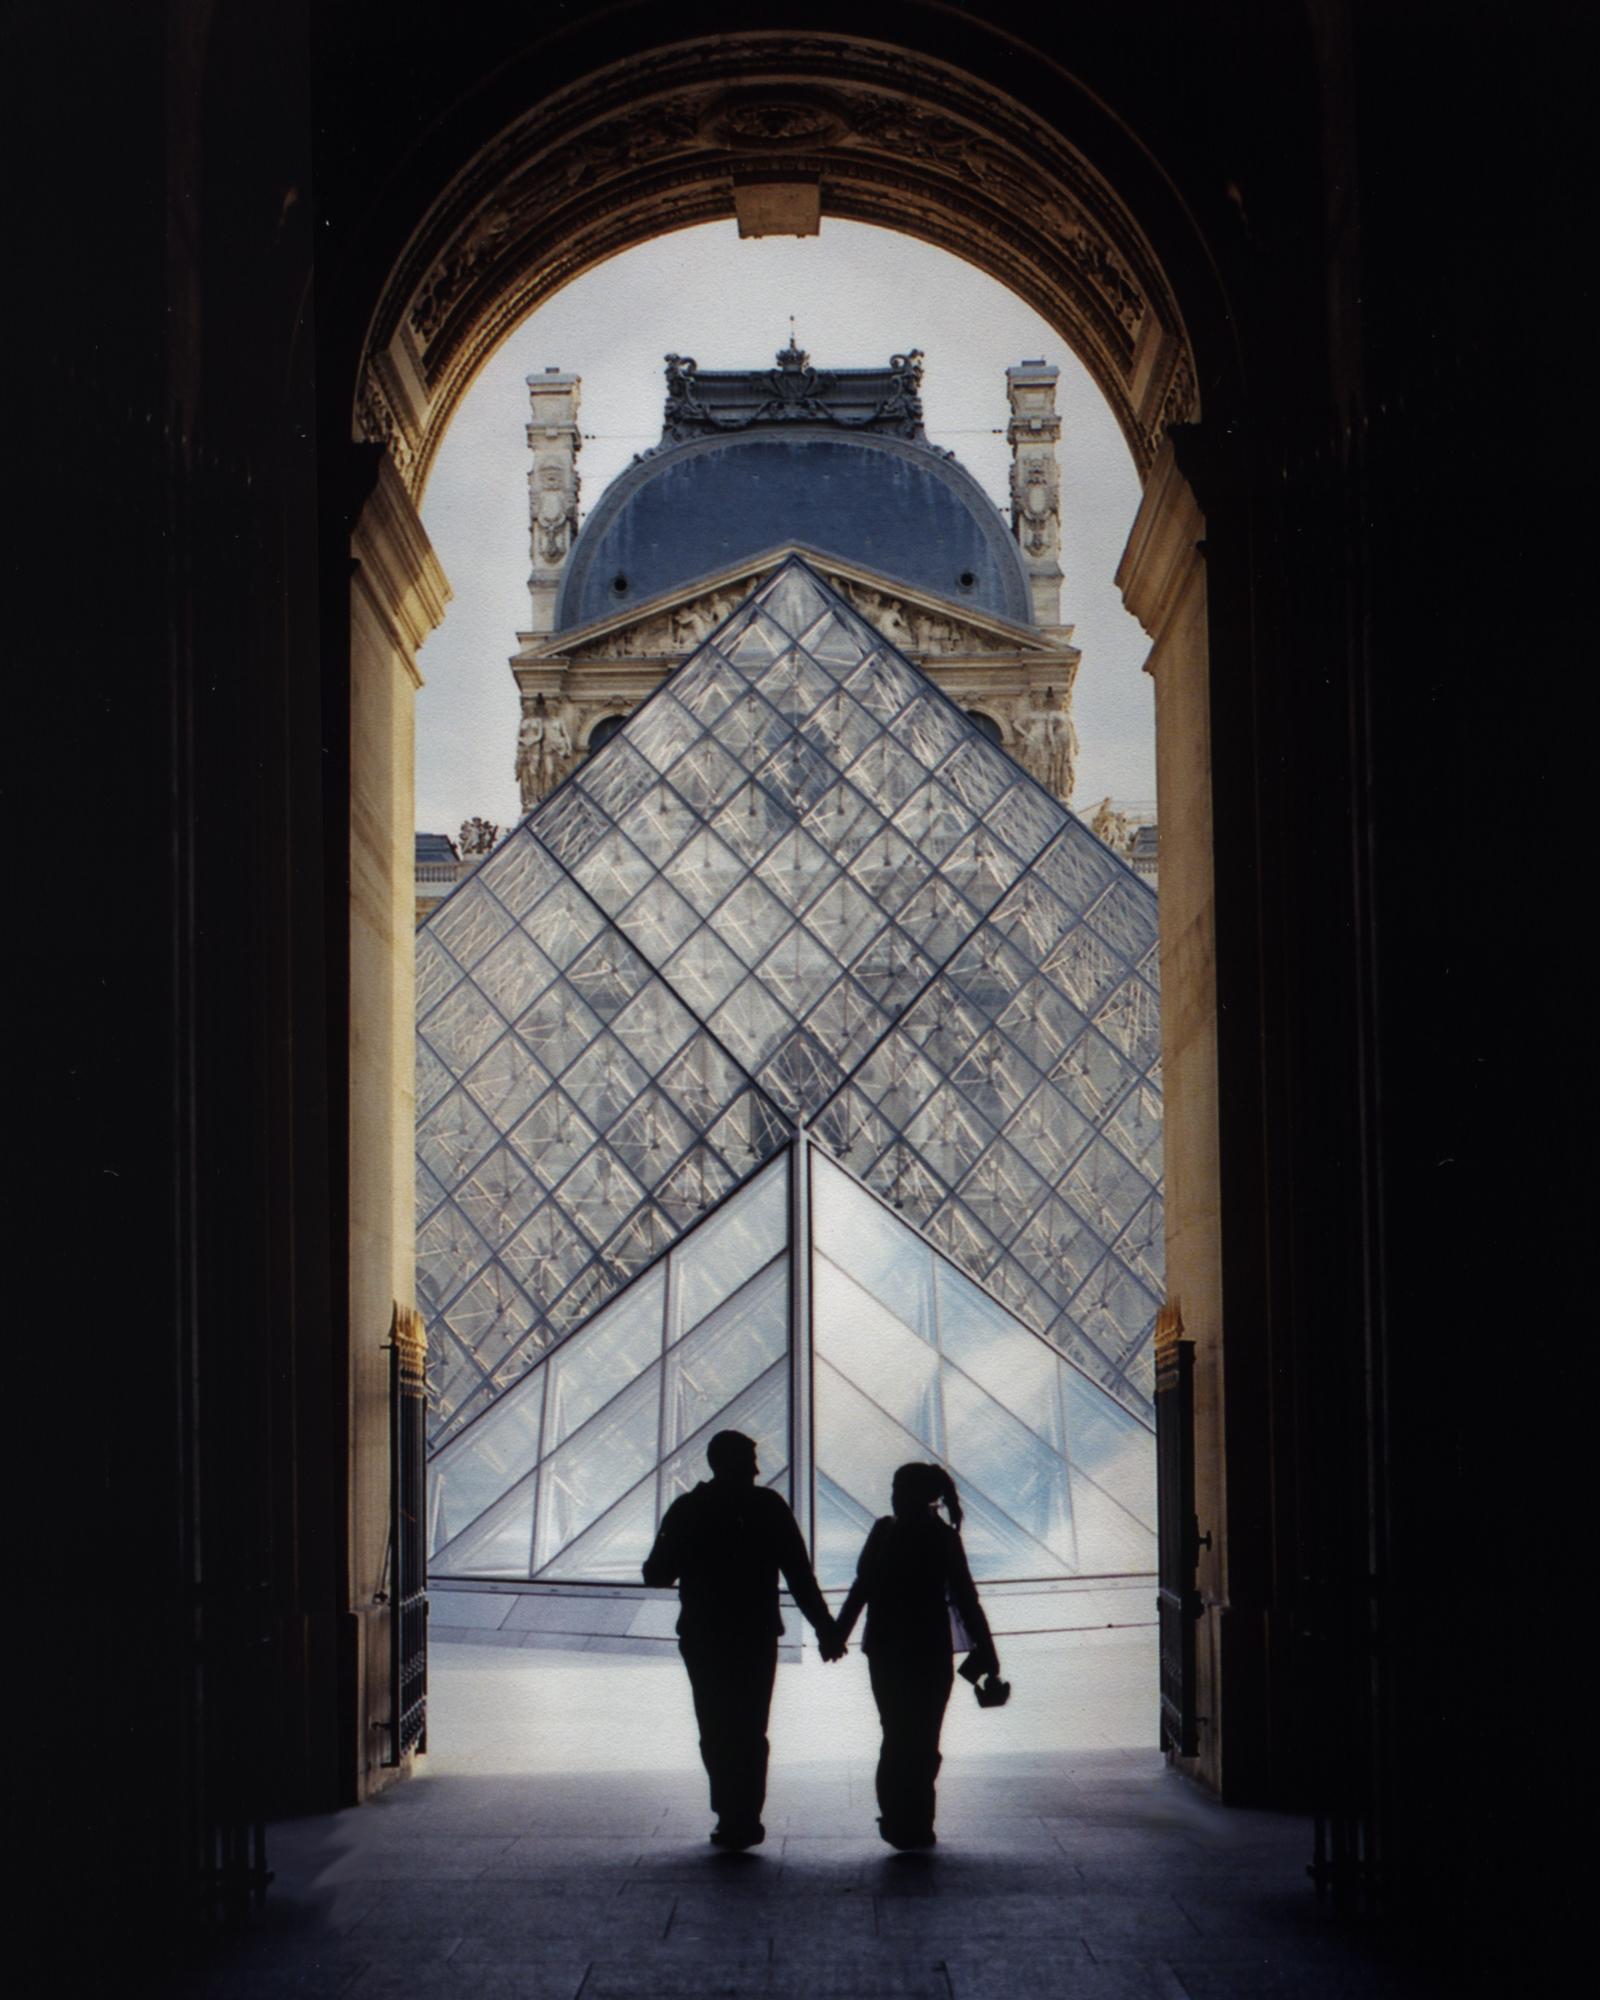 Paris_050118_33512.JPG